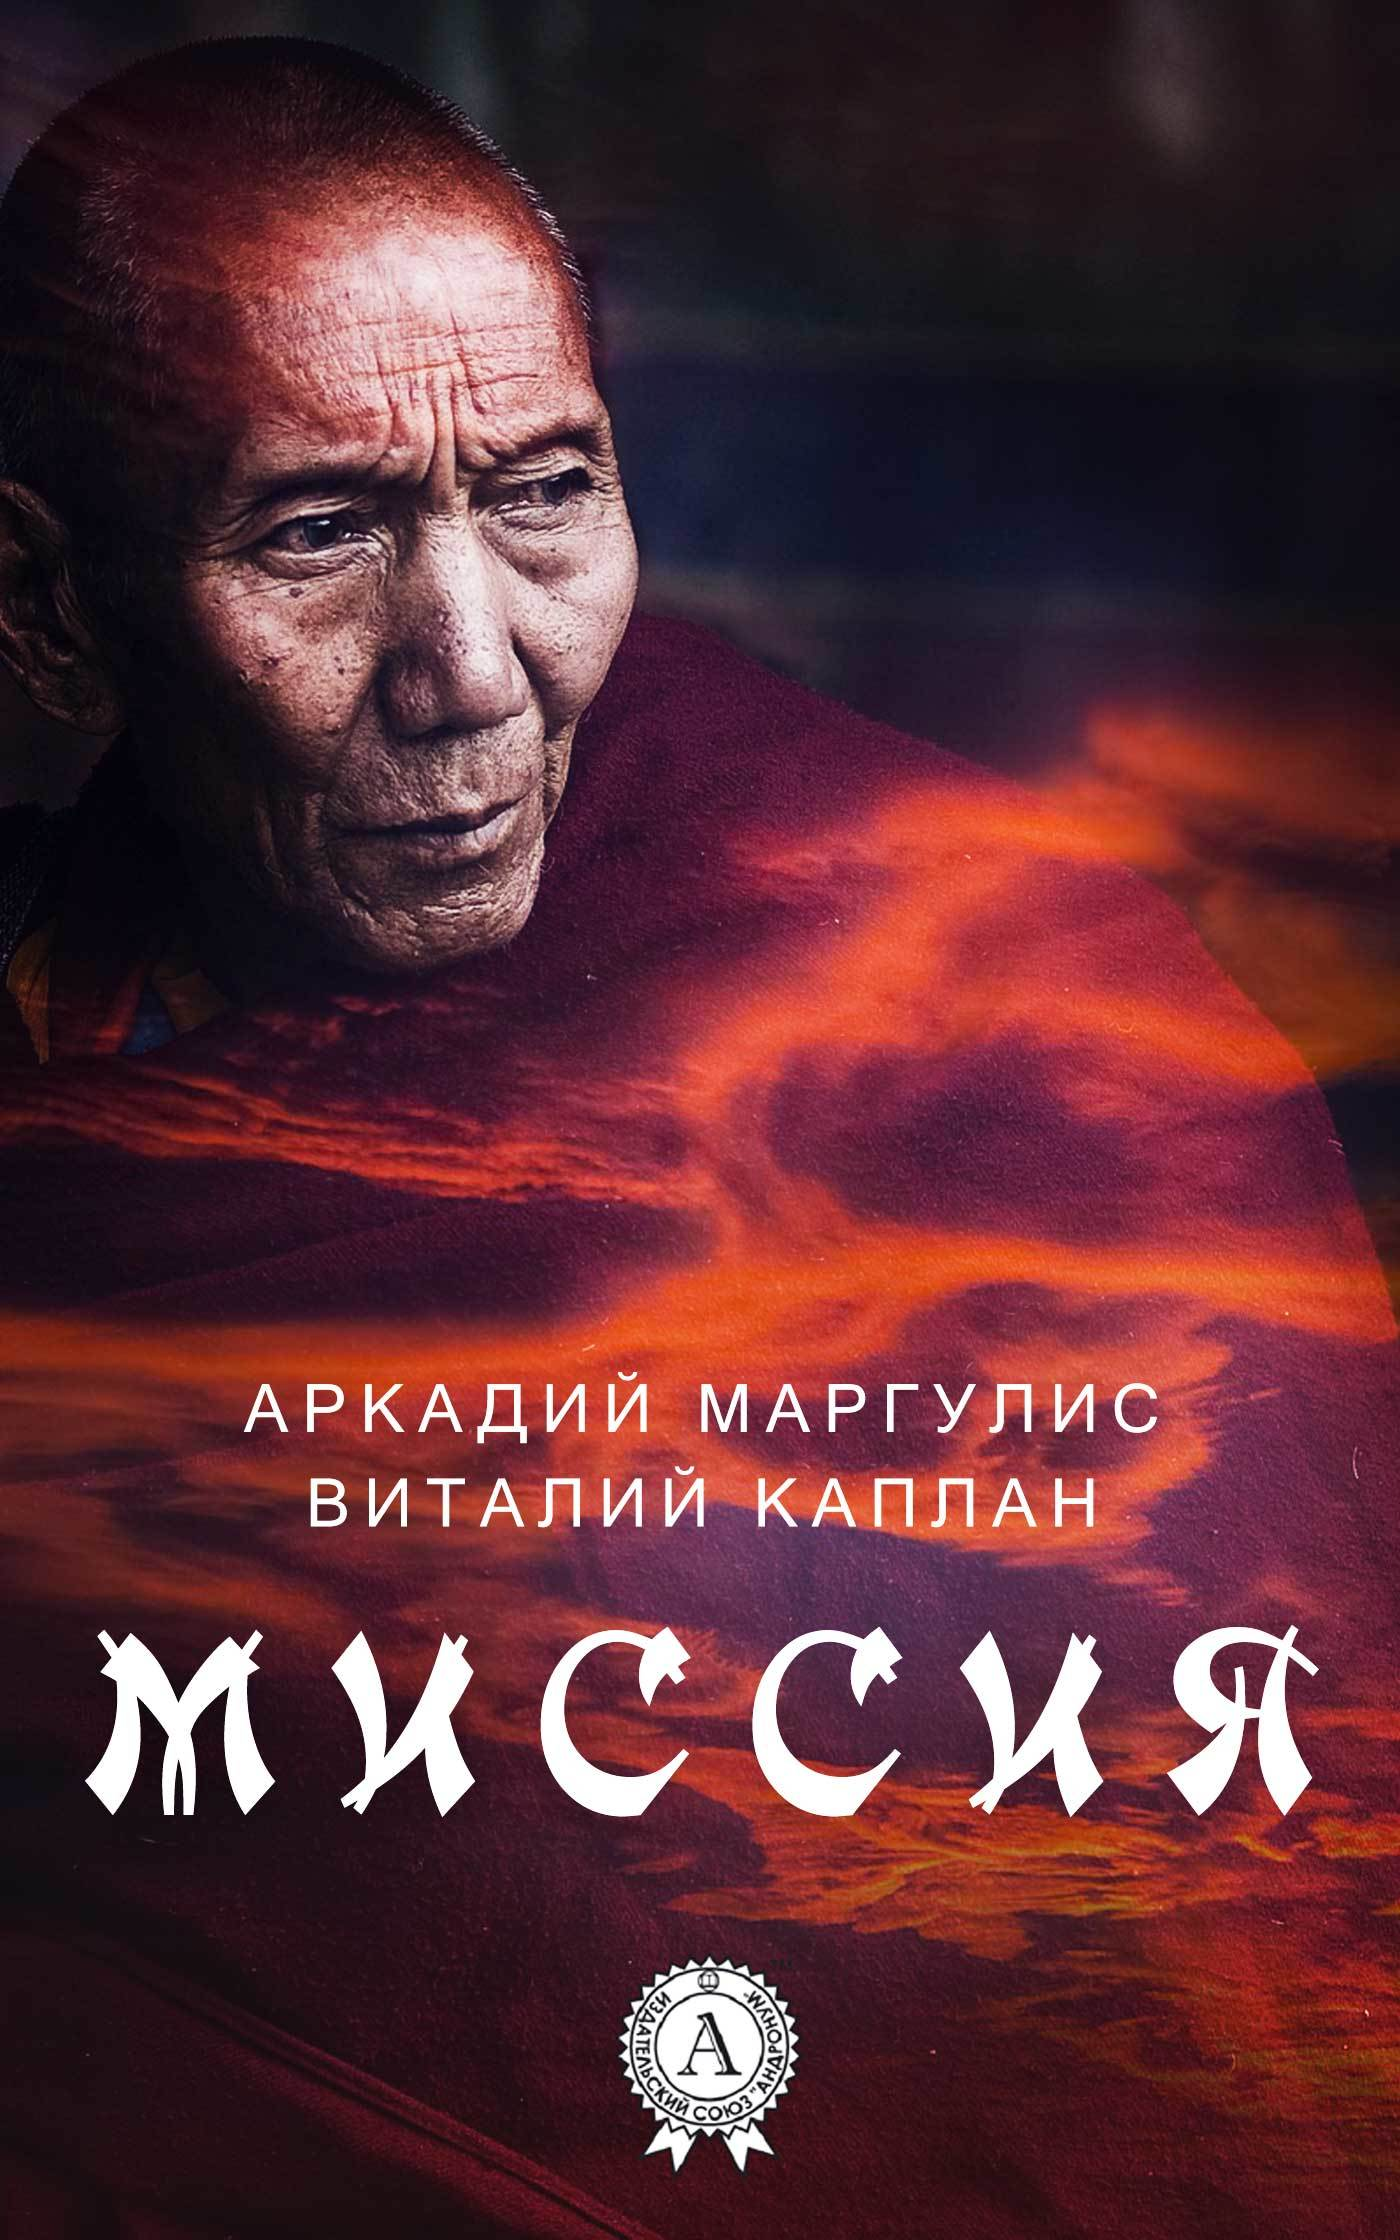 Виталий Каплан, Аркадий Маргулис - Миссия